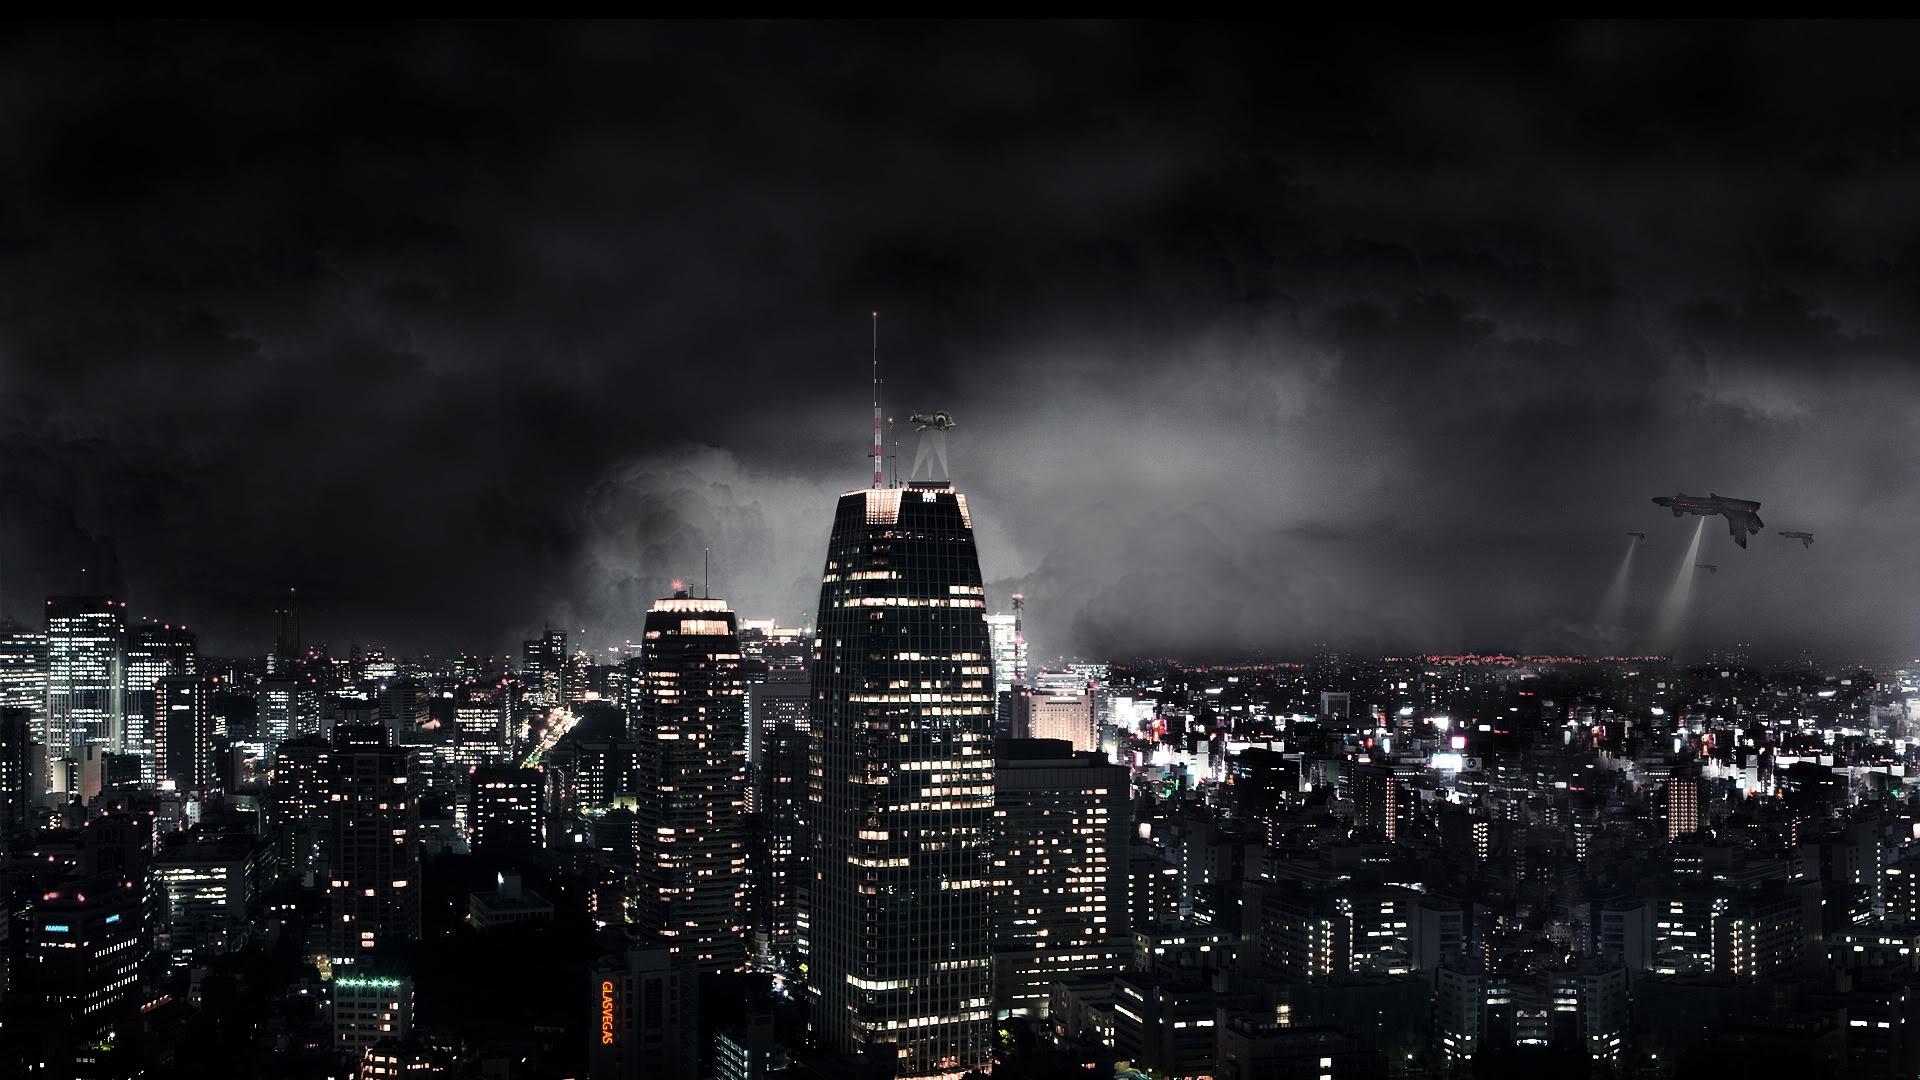 Cool Wallpaper Night Fantasy - dark_city_night_fantasy_skyscrapers_63183_1920x1080  Photograph-18210.jpg